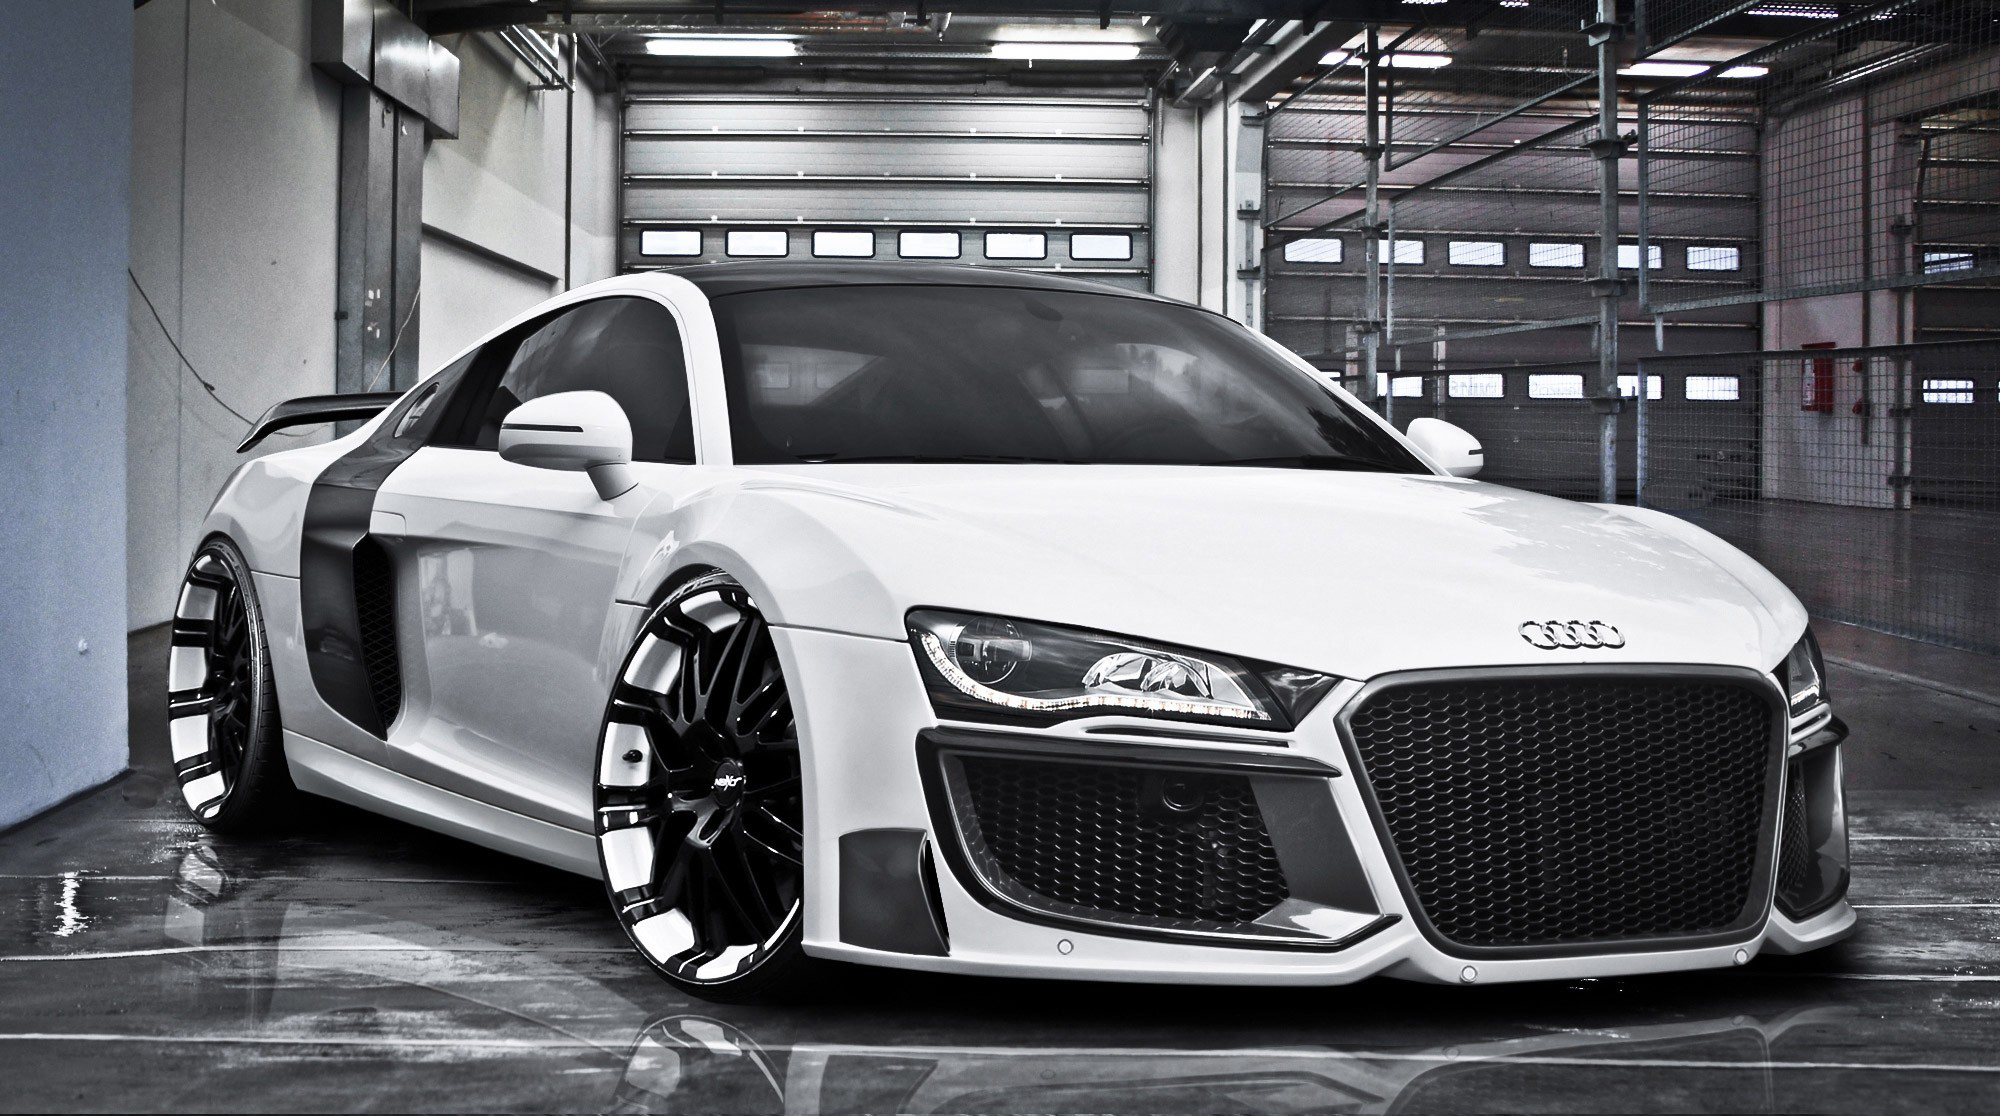 Audi R8 Full Hd Fond D 233 Cran And Arri 232 Re Plan 2000x1116